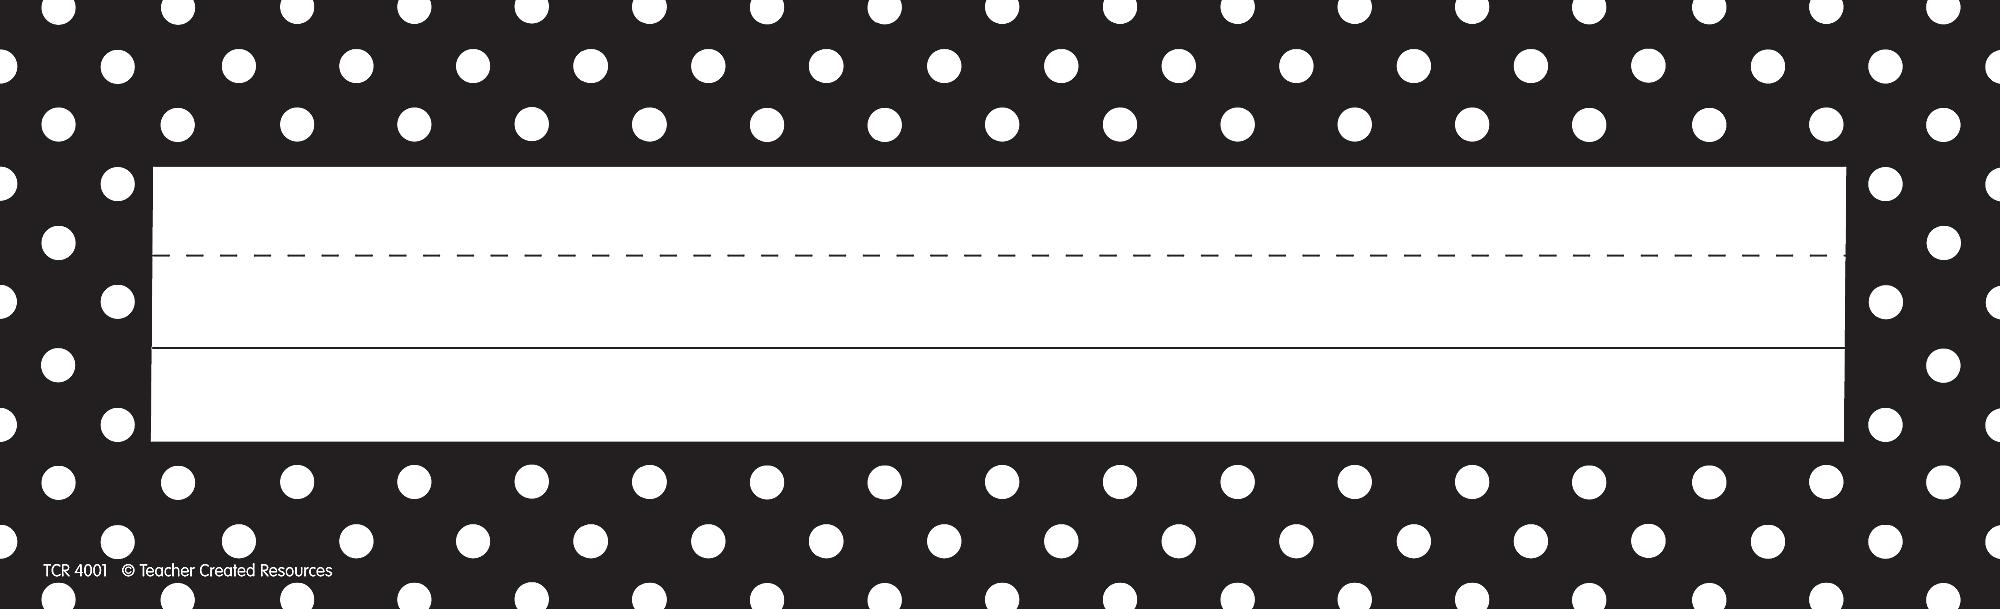 Black Polka Dots Flat Name Plates Tcr4001 Teacher